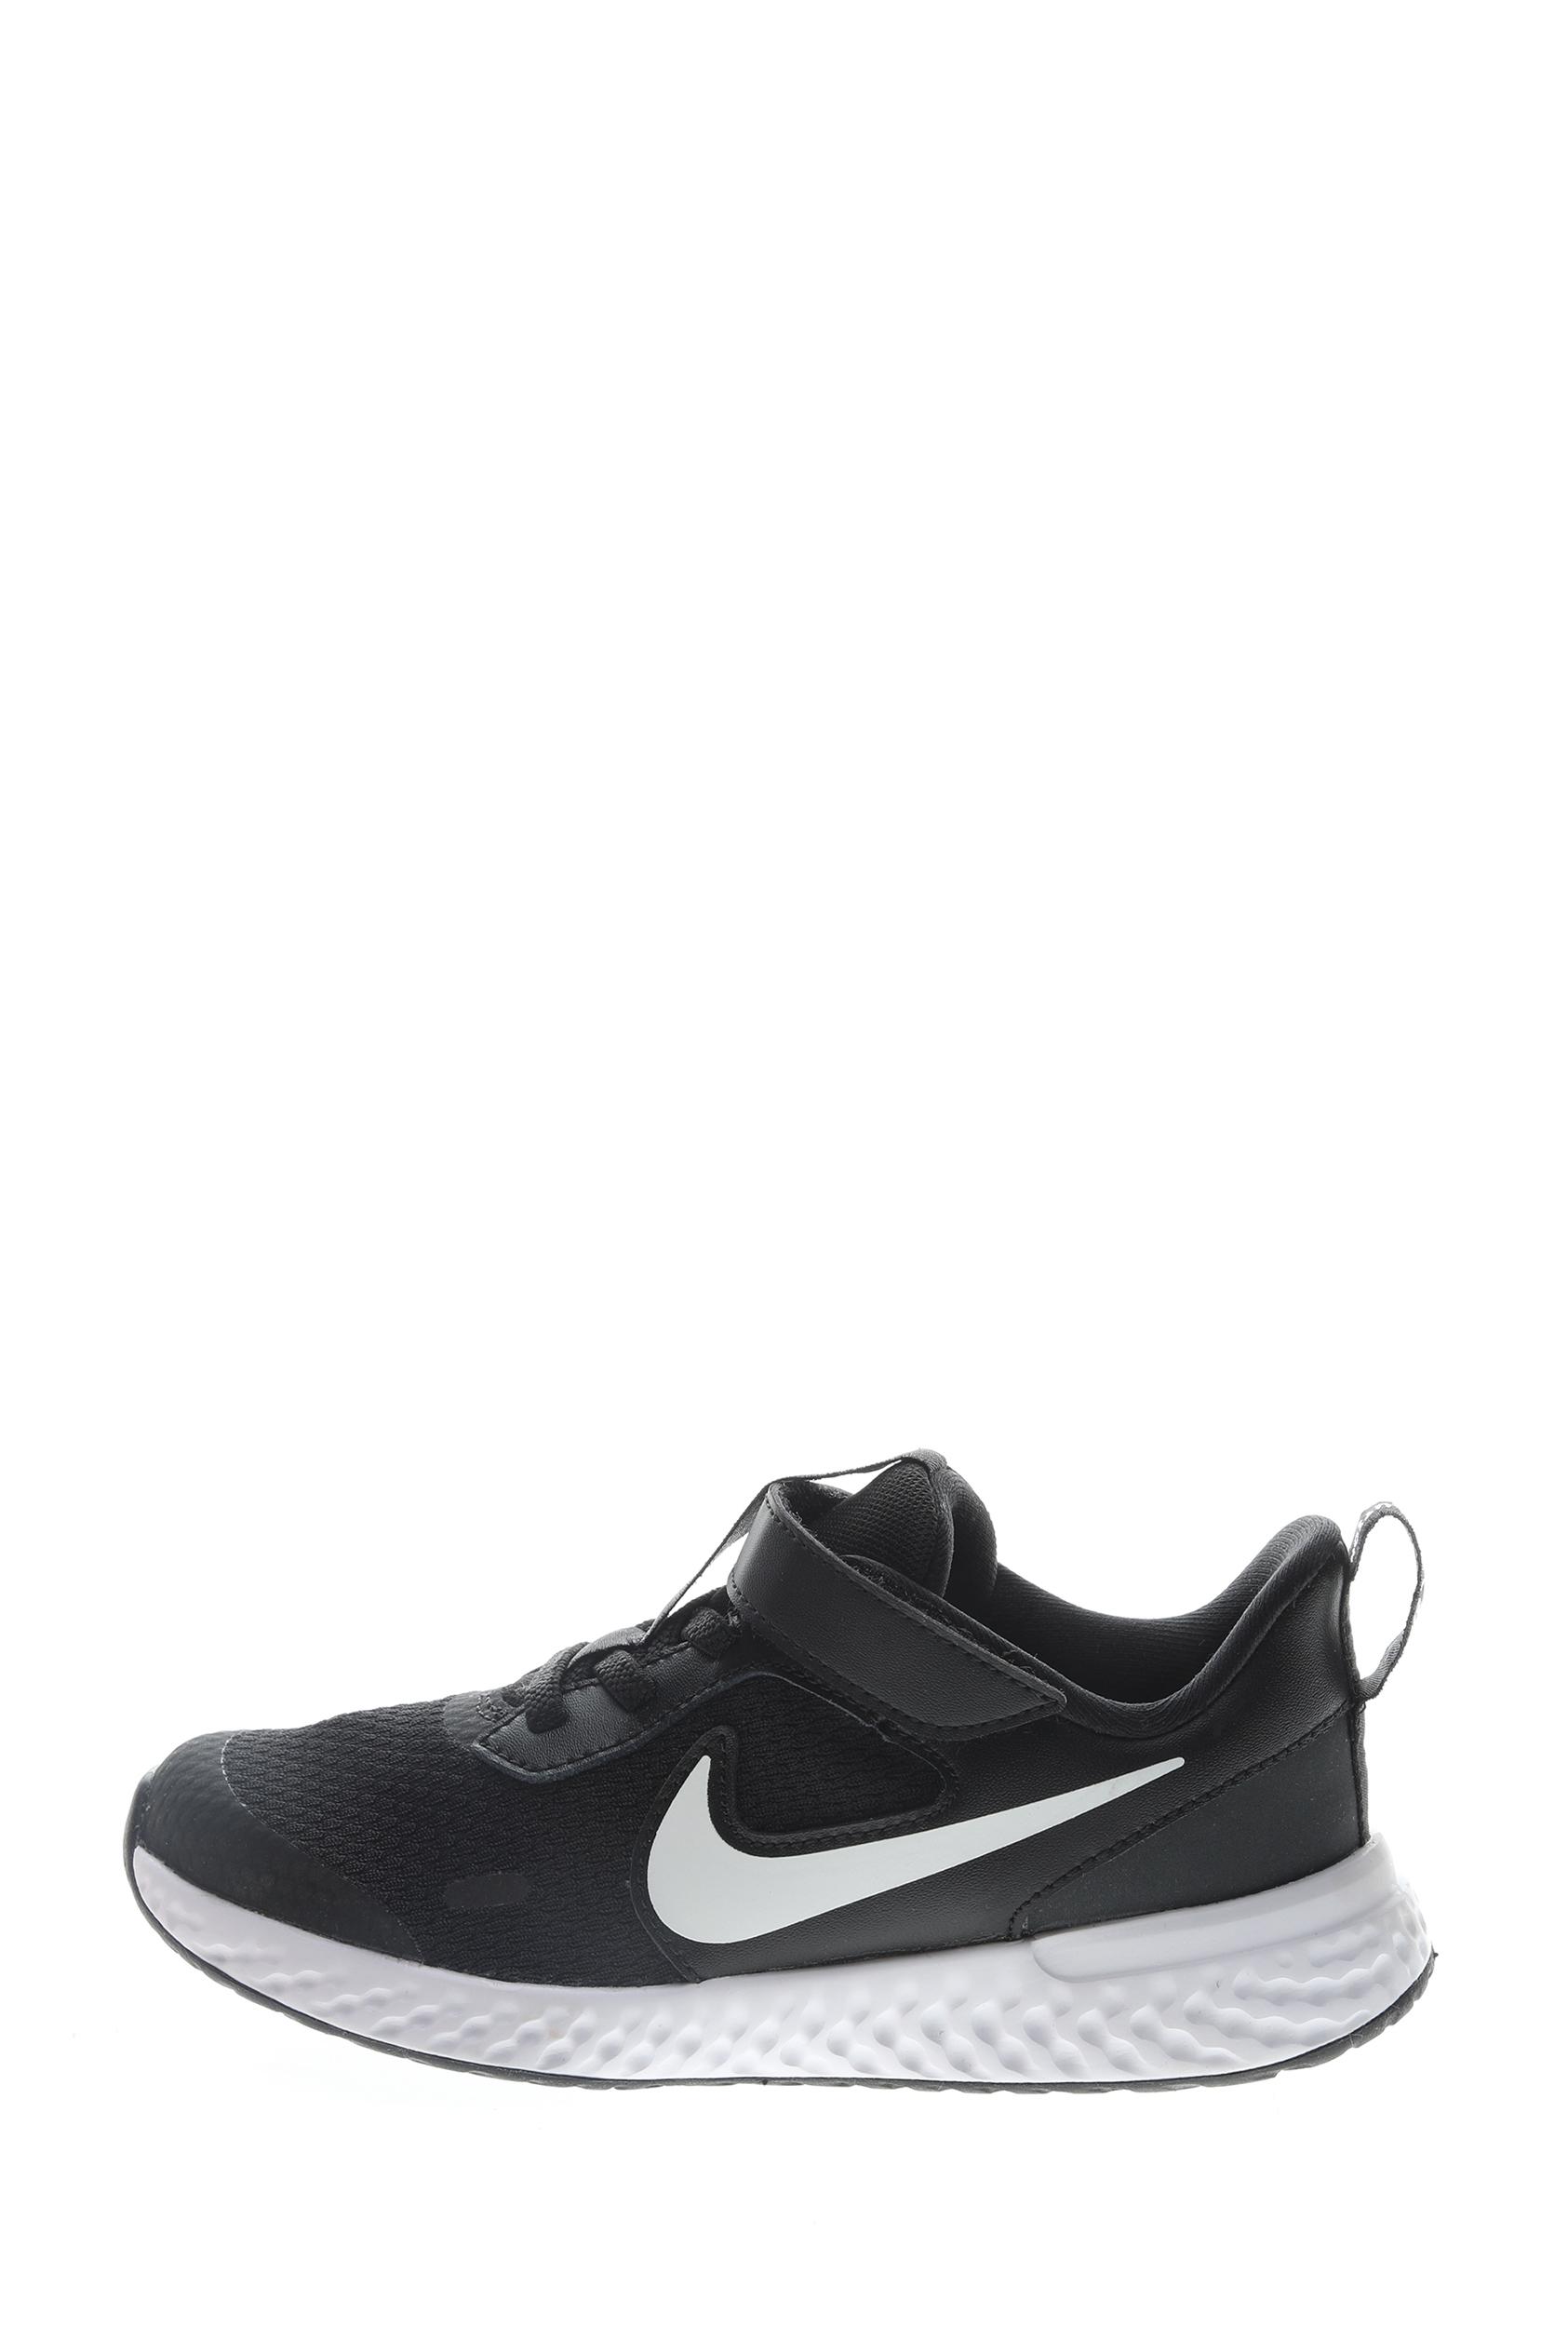 NIKE – Παιδικά παπούτσια running NIKE REVOLUTION 5 (PSV) μαύρα